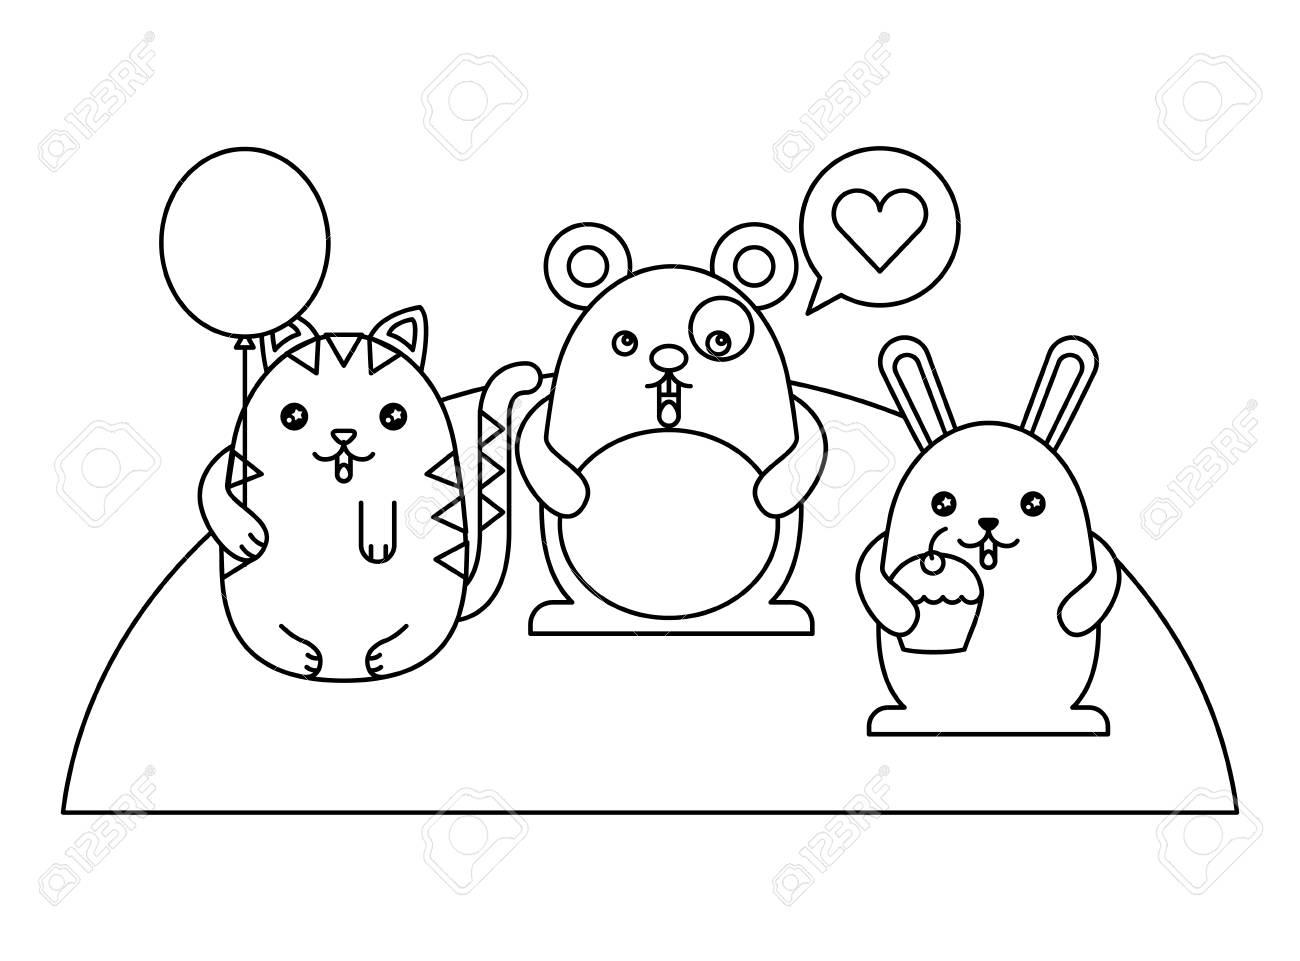 cute animals with speech bubble and helium ballon kawaii character